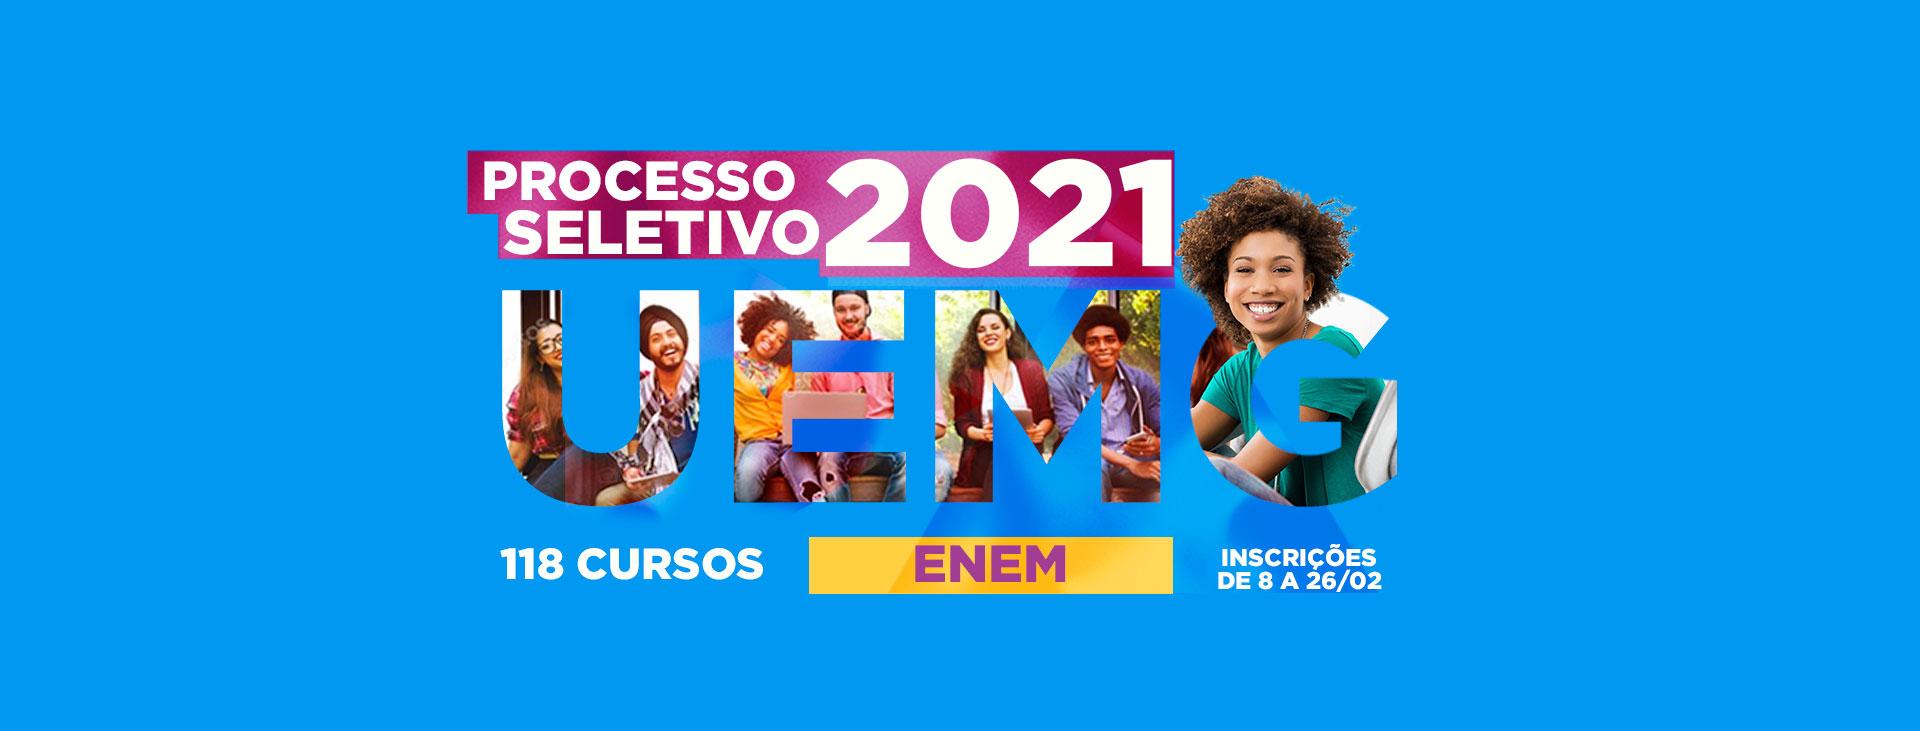 Foto: Divulgação / Uemg